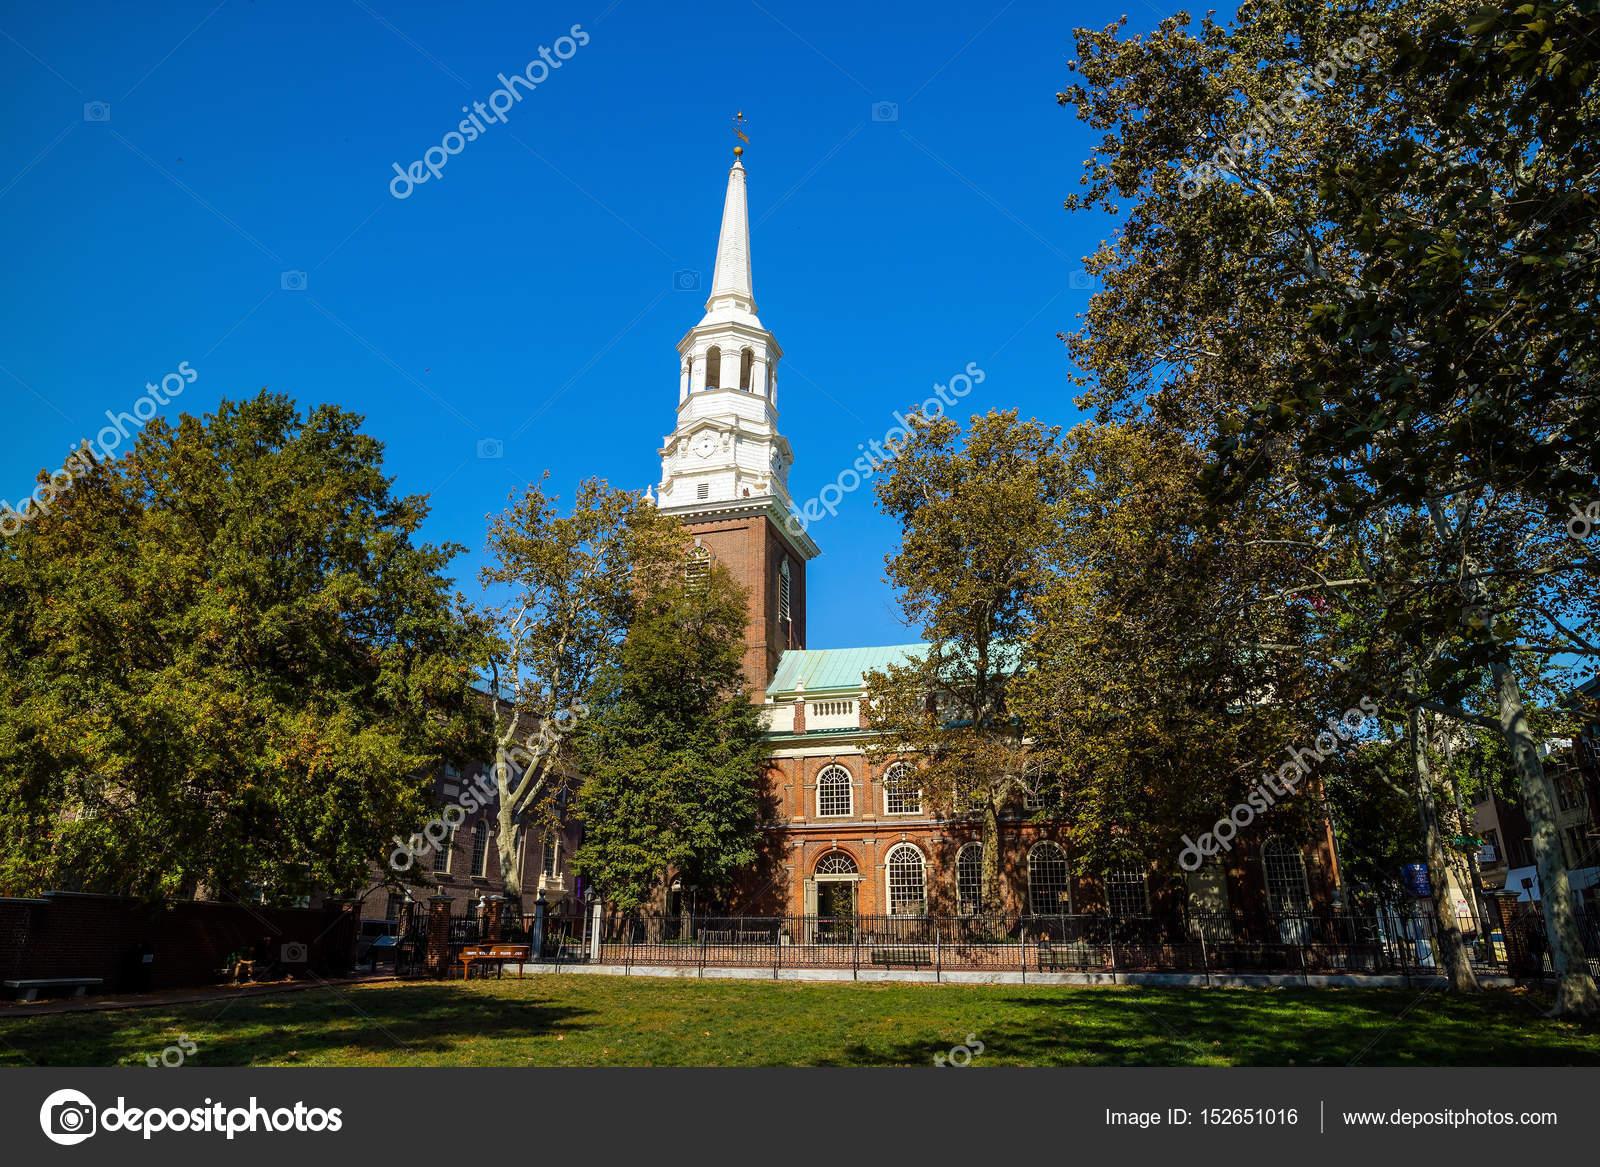 Christuskirche in philadelphia pennsylvania stockfoto for 2533 raumgestaltung und entwerfen